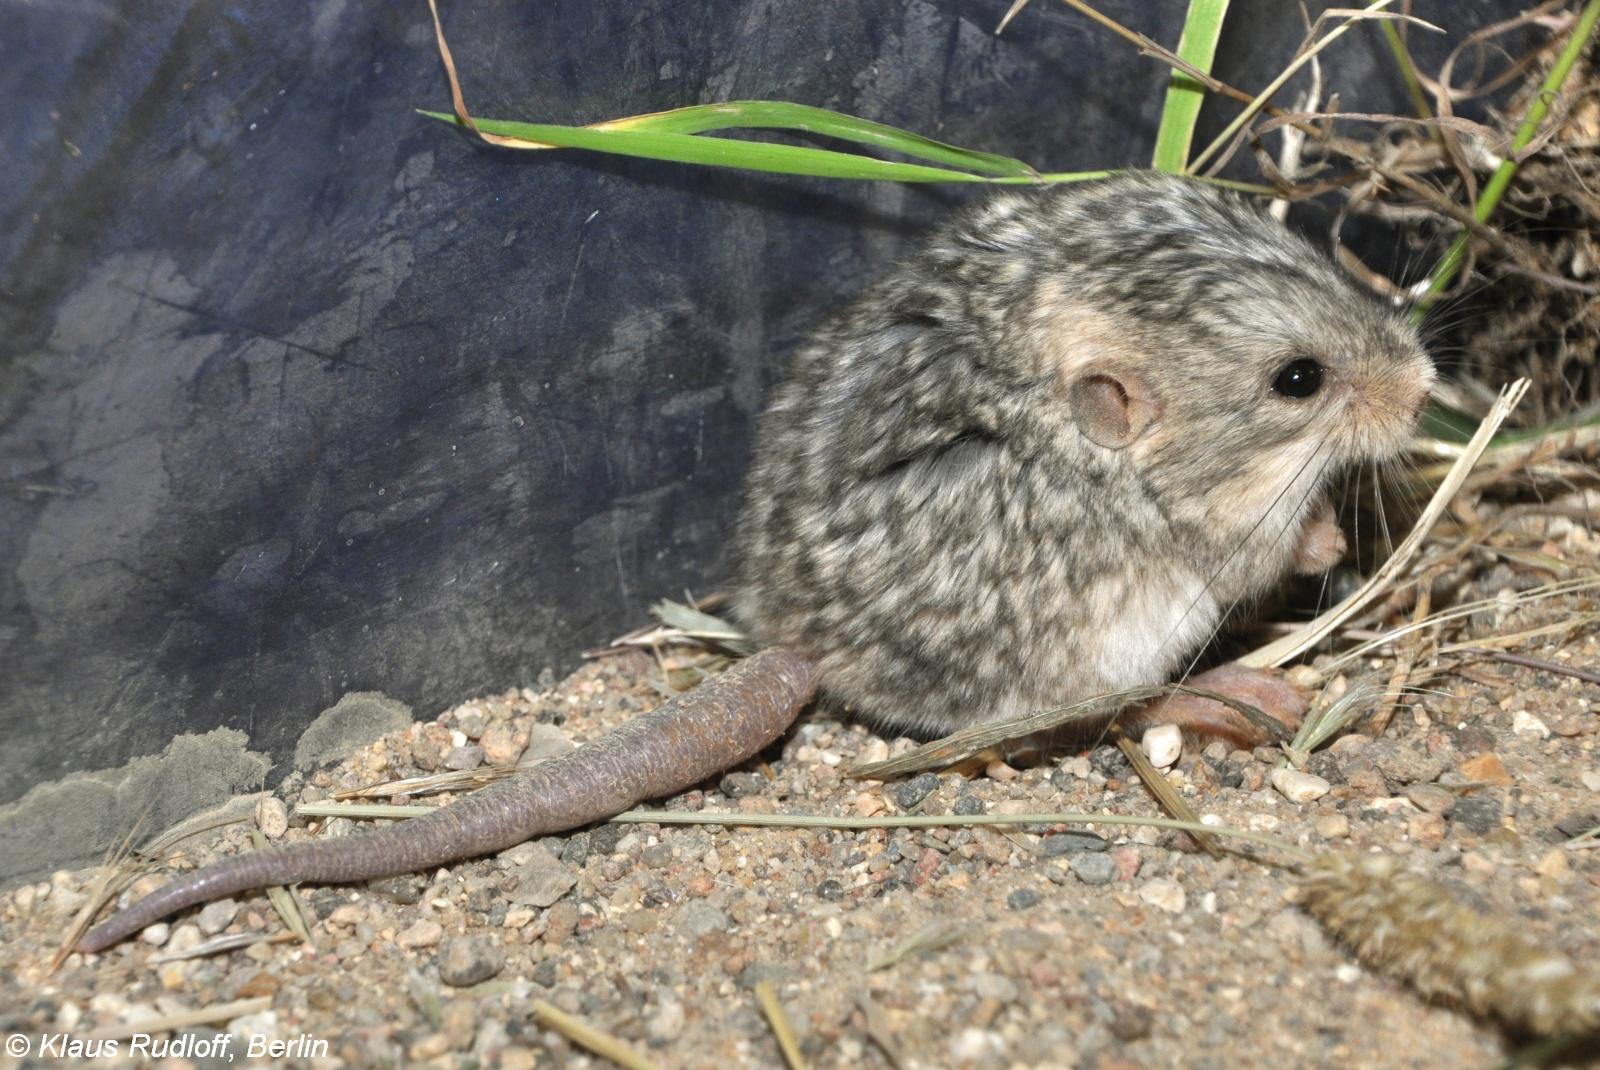 Image - Cardiocranius paradoxus (Five-toed Pygmy Jerboa ... - photo#2